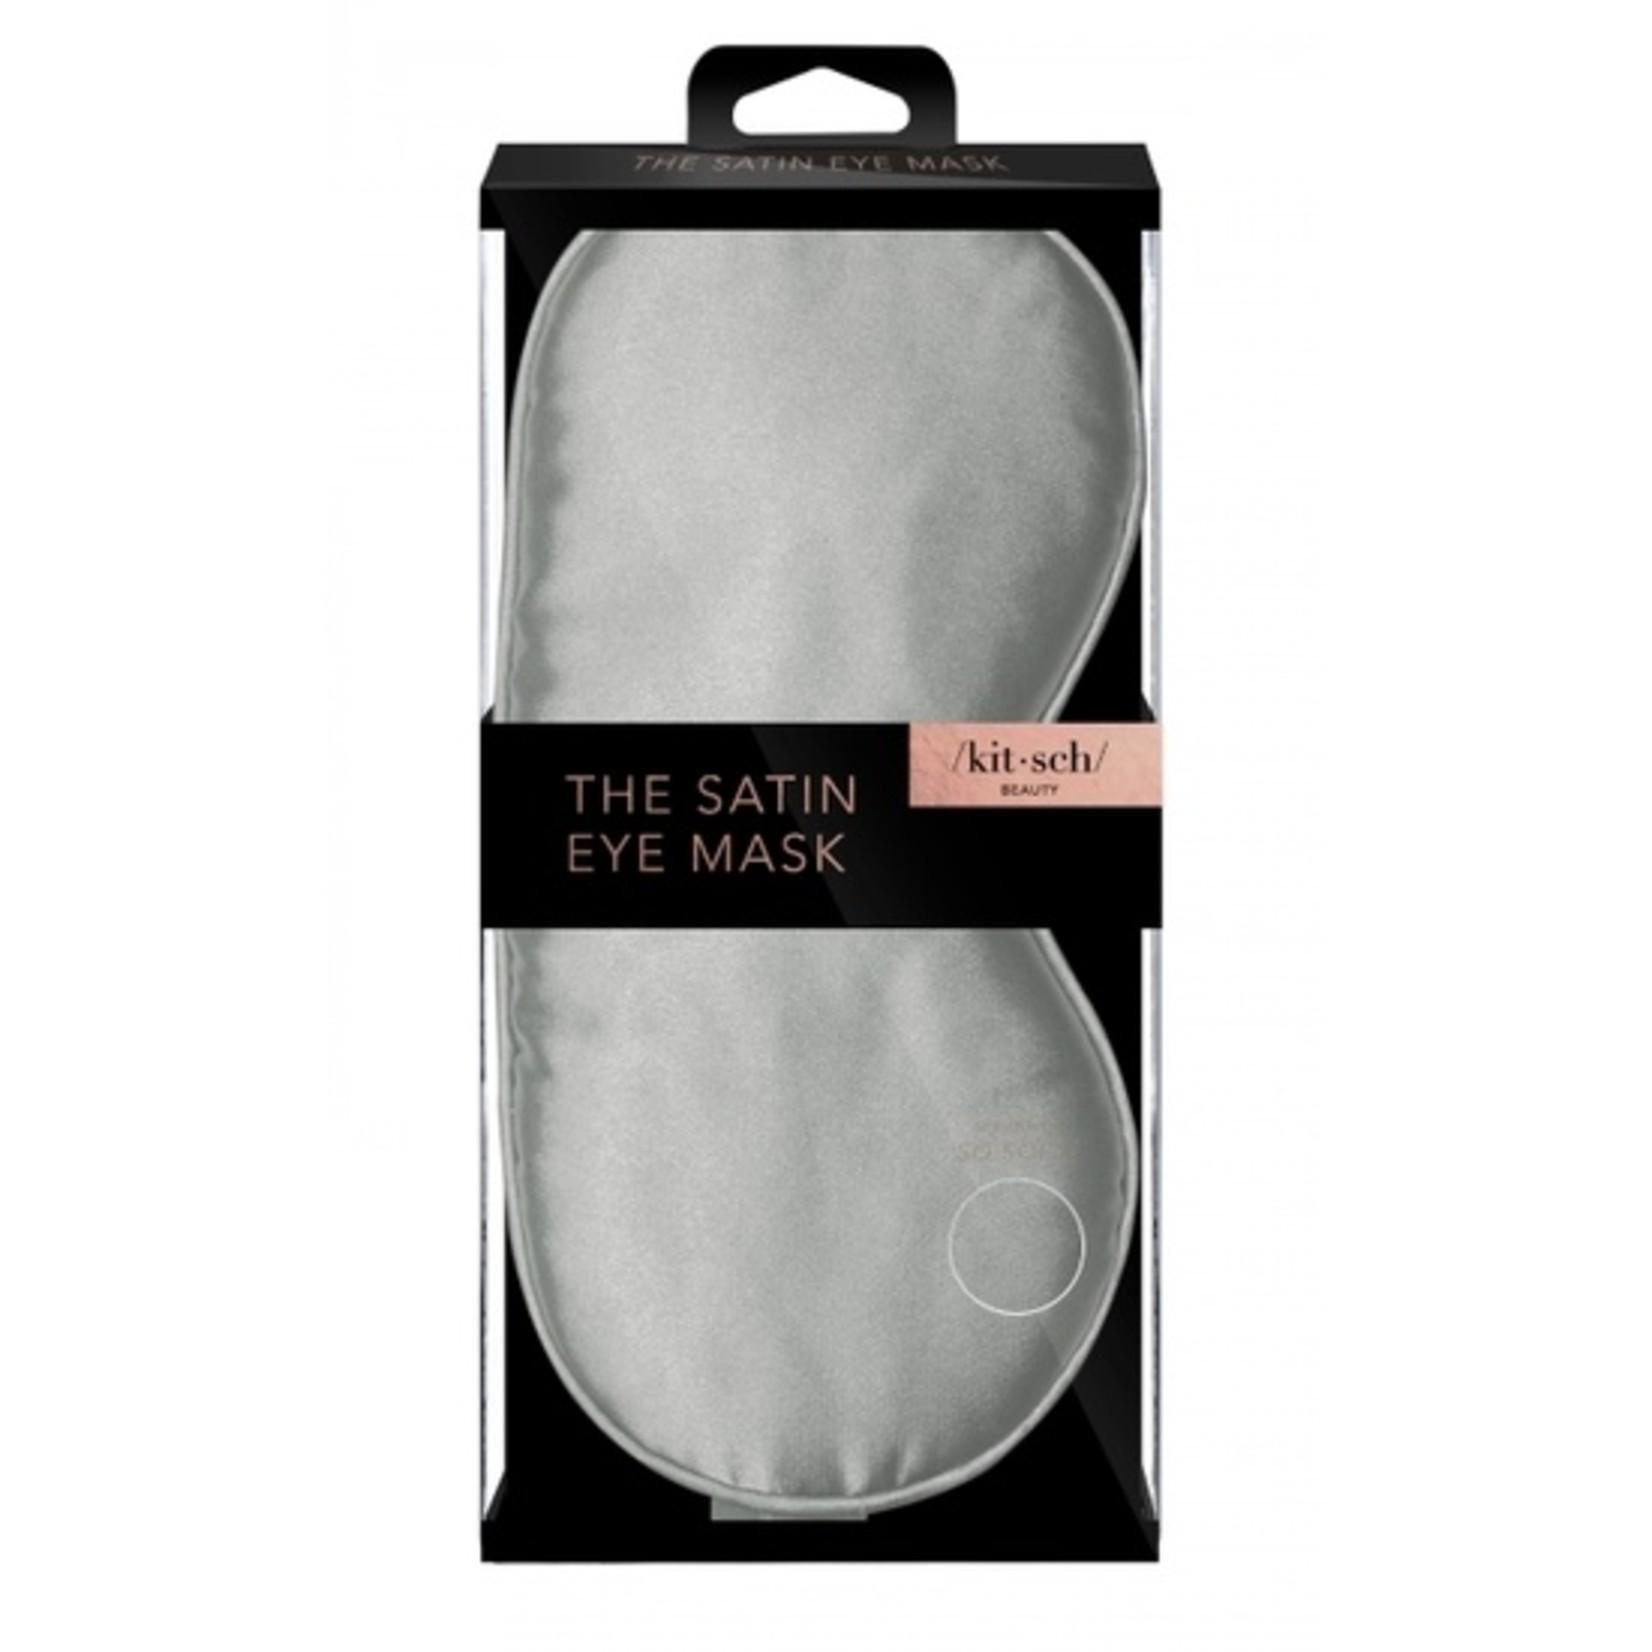 Kitsch Satin Eye Mask in Silver